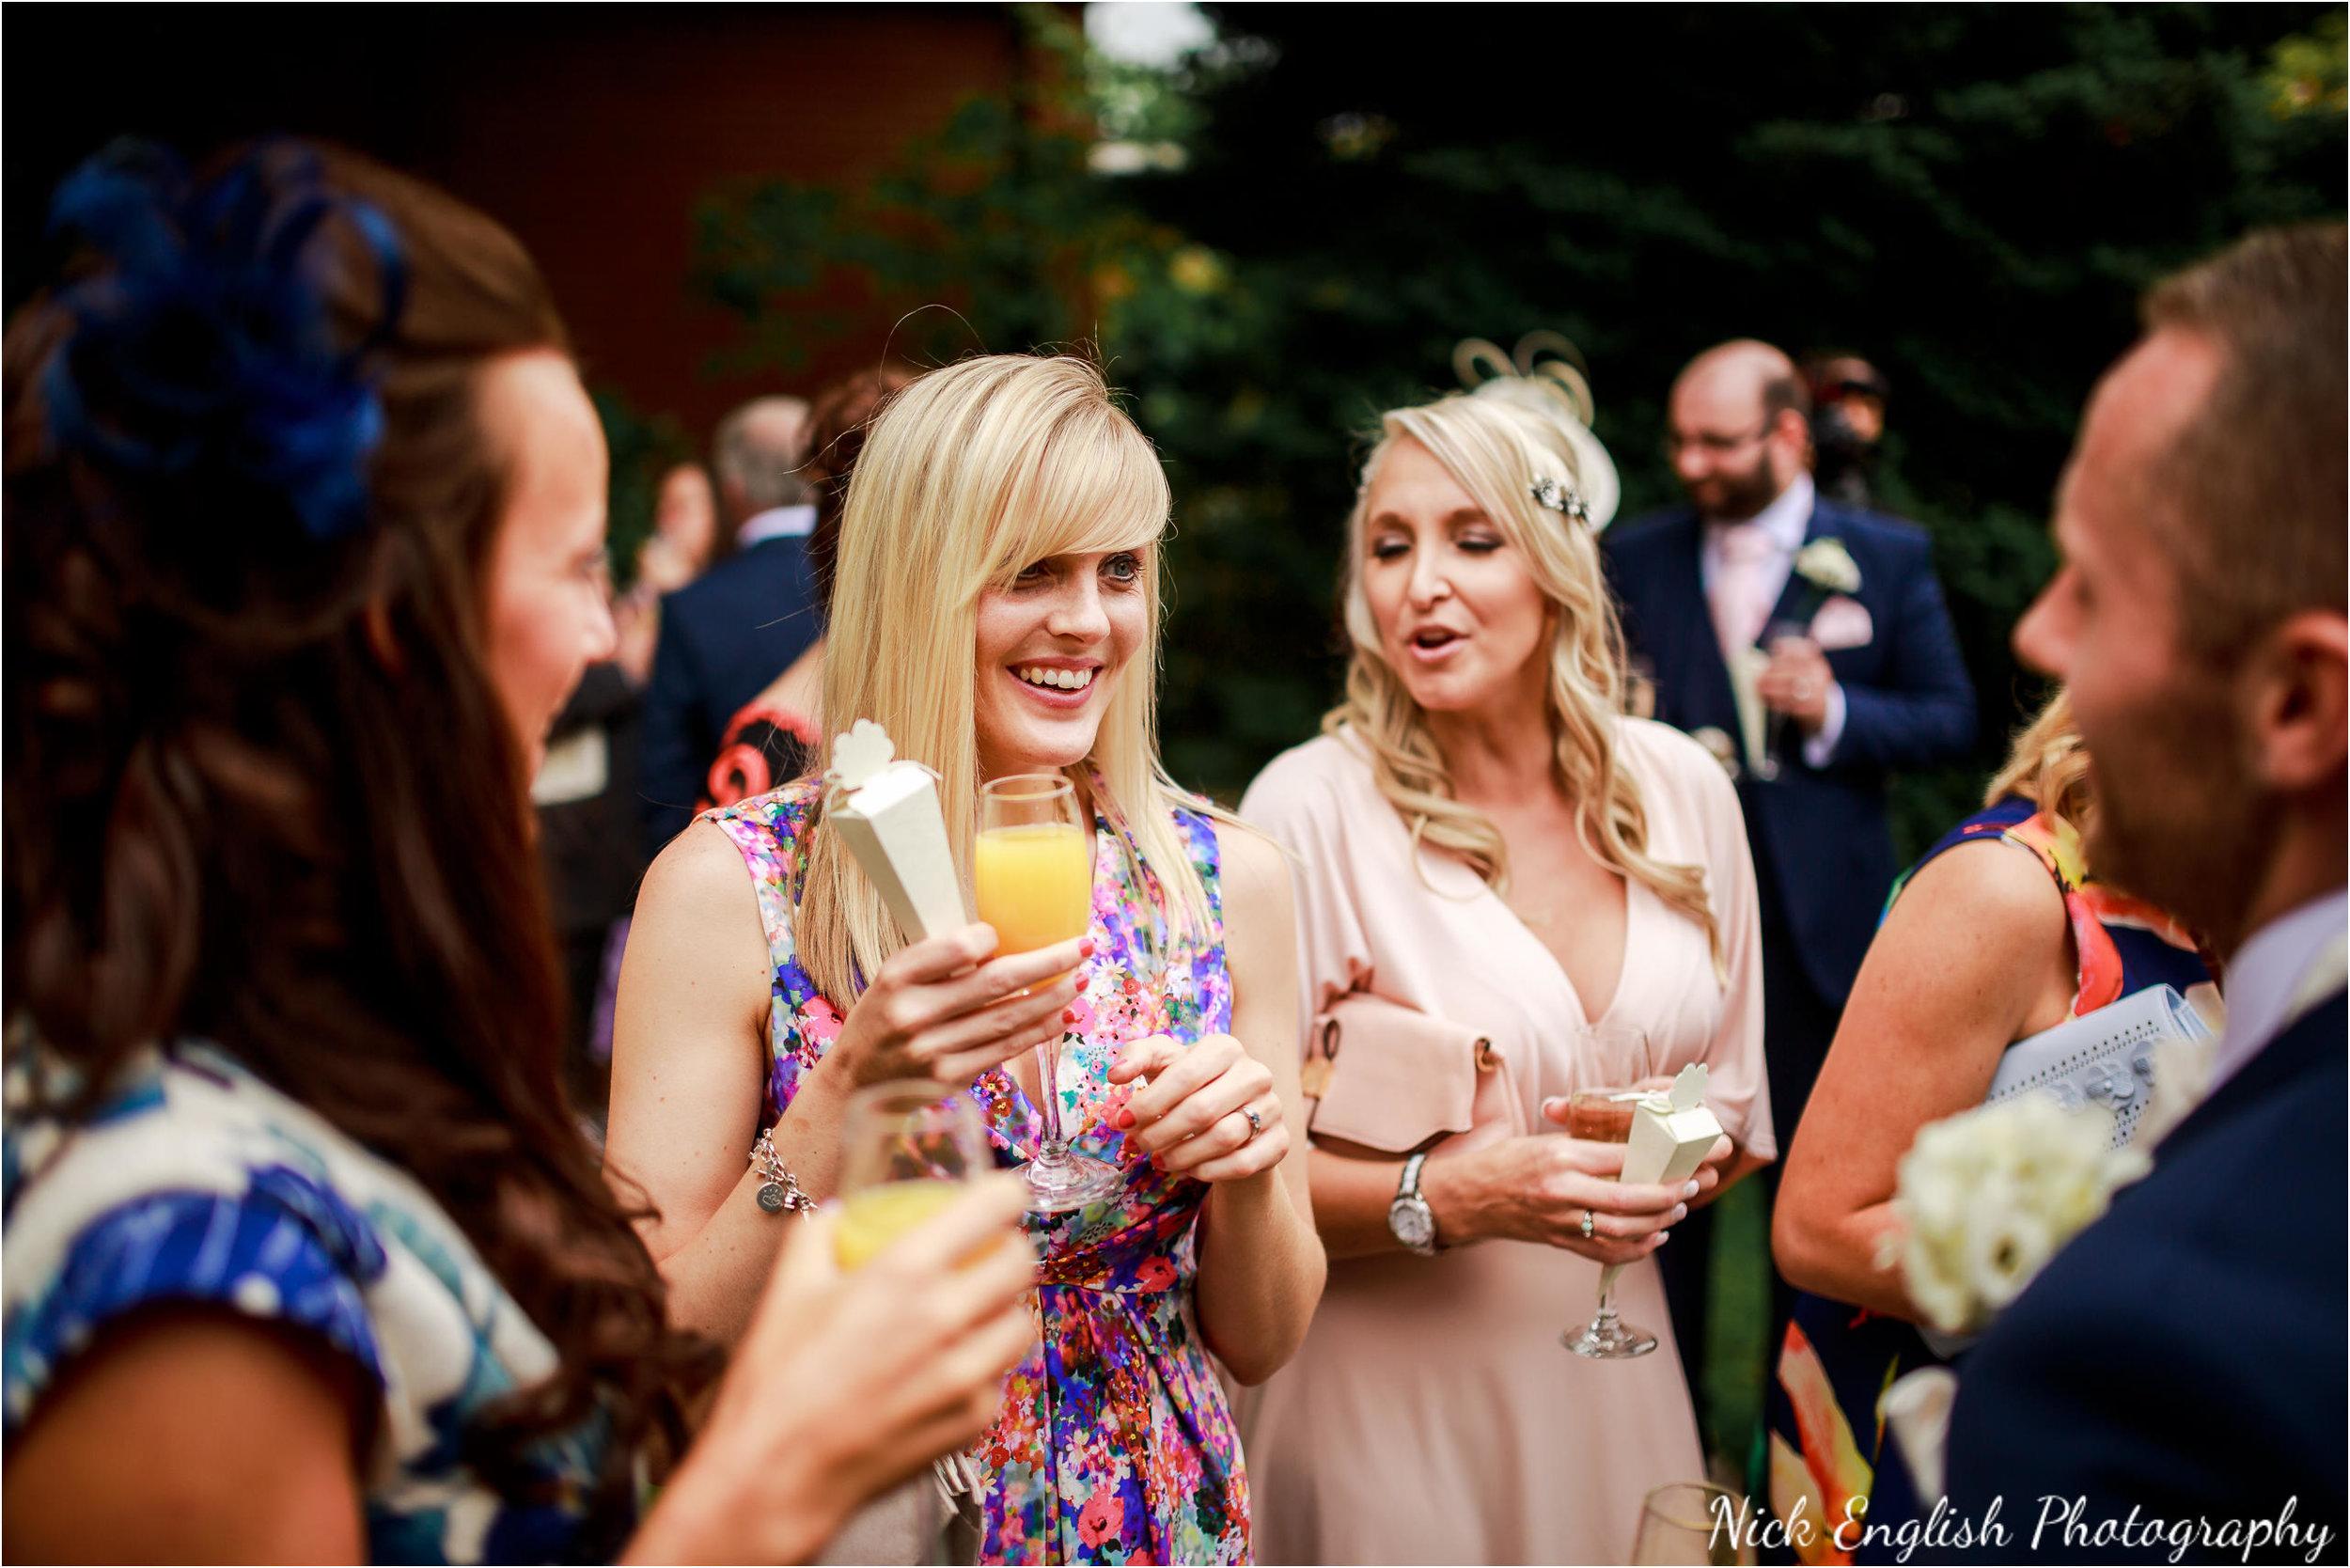 Emily David Wedding Photographs at Barton Grange Preston by Nick English Photography 112jpg.jpeg